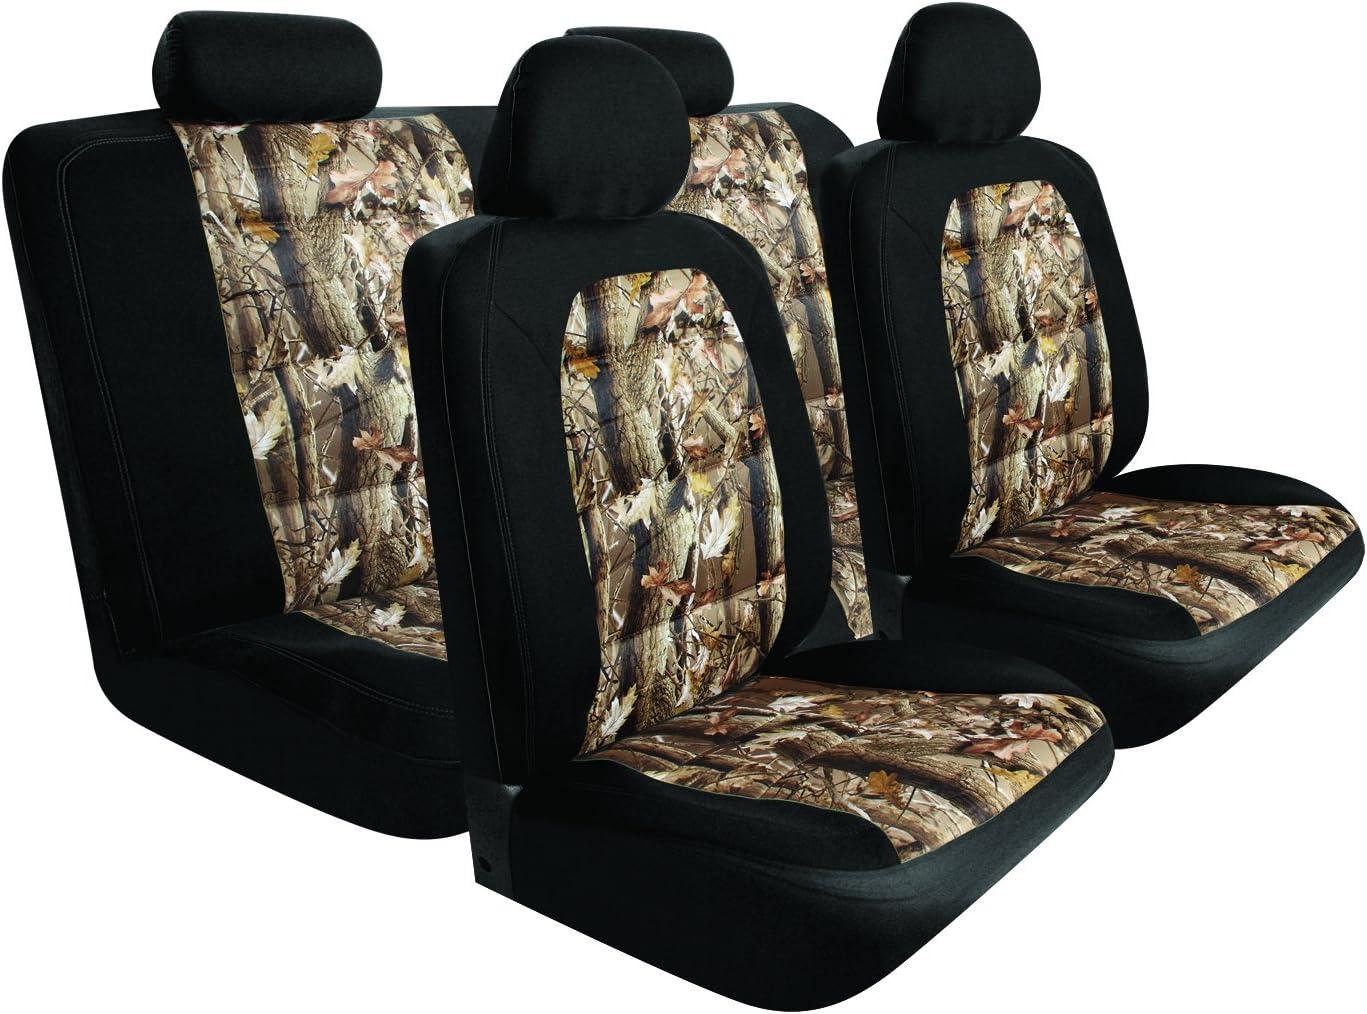 Pilot Automotive Nashville-Davidson Mall SC-5025E Black 10-Piece Mesh Camo Cover Popular products Seat